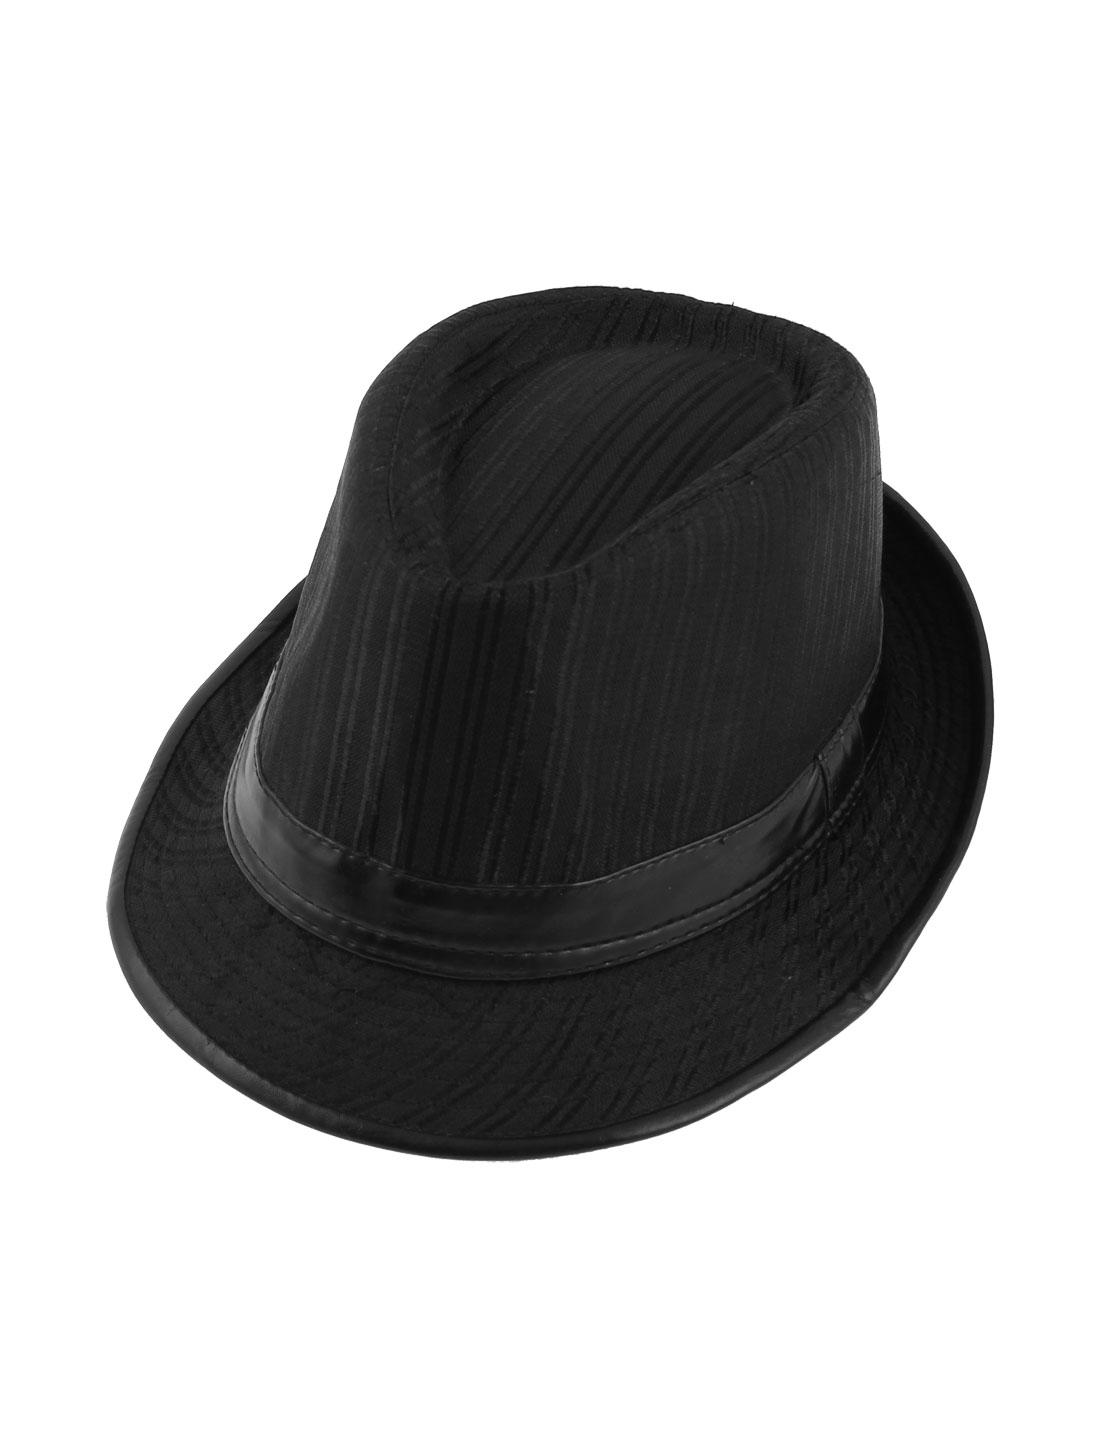 Man Polyester Lined Floppy Brim Bowler Homburg Fedora Hat Black